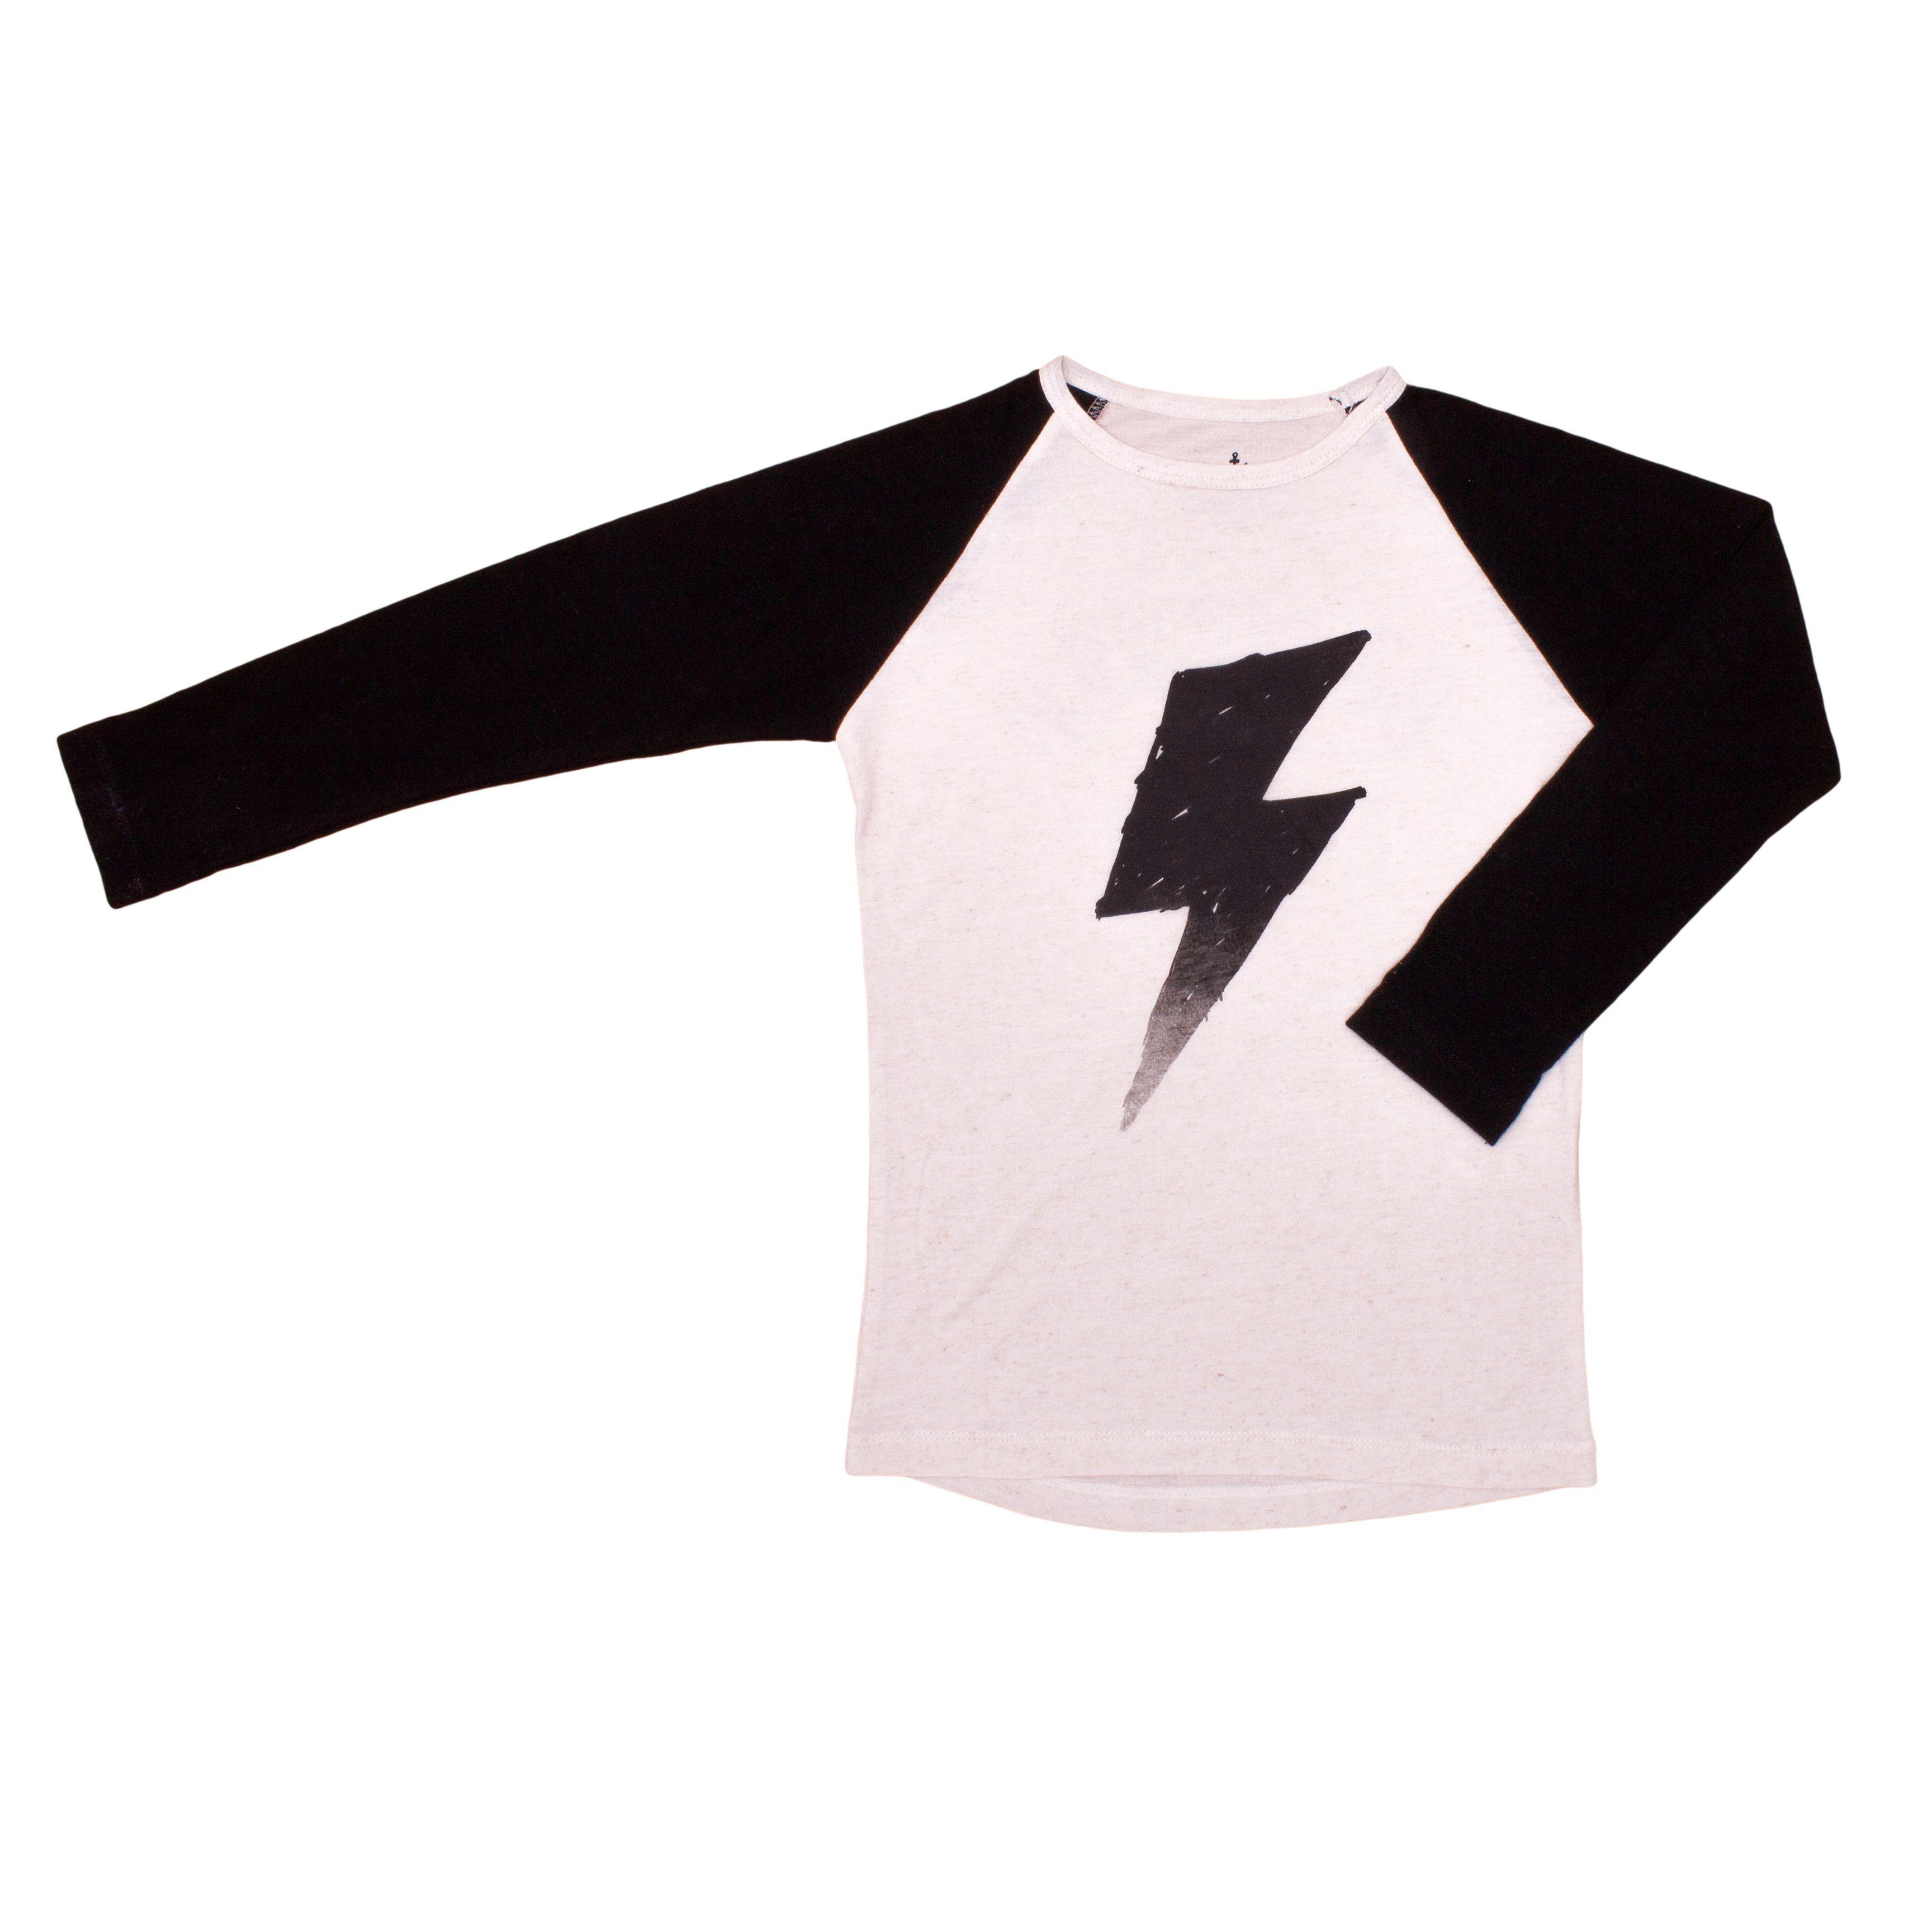 Noe & Zoe. Raglan. £32. #tshirt #lightening #kidsclothing